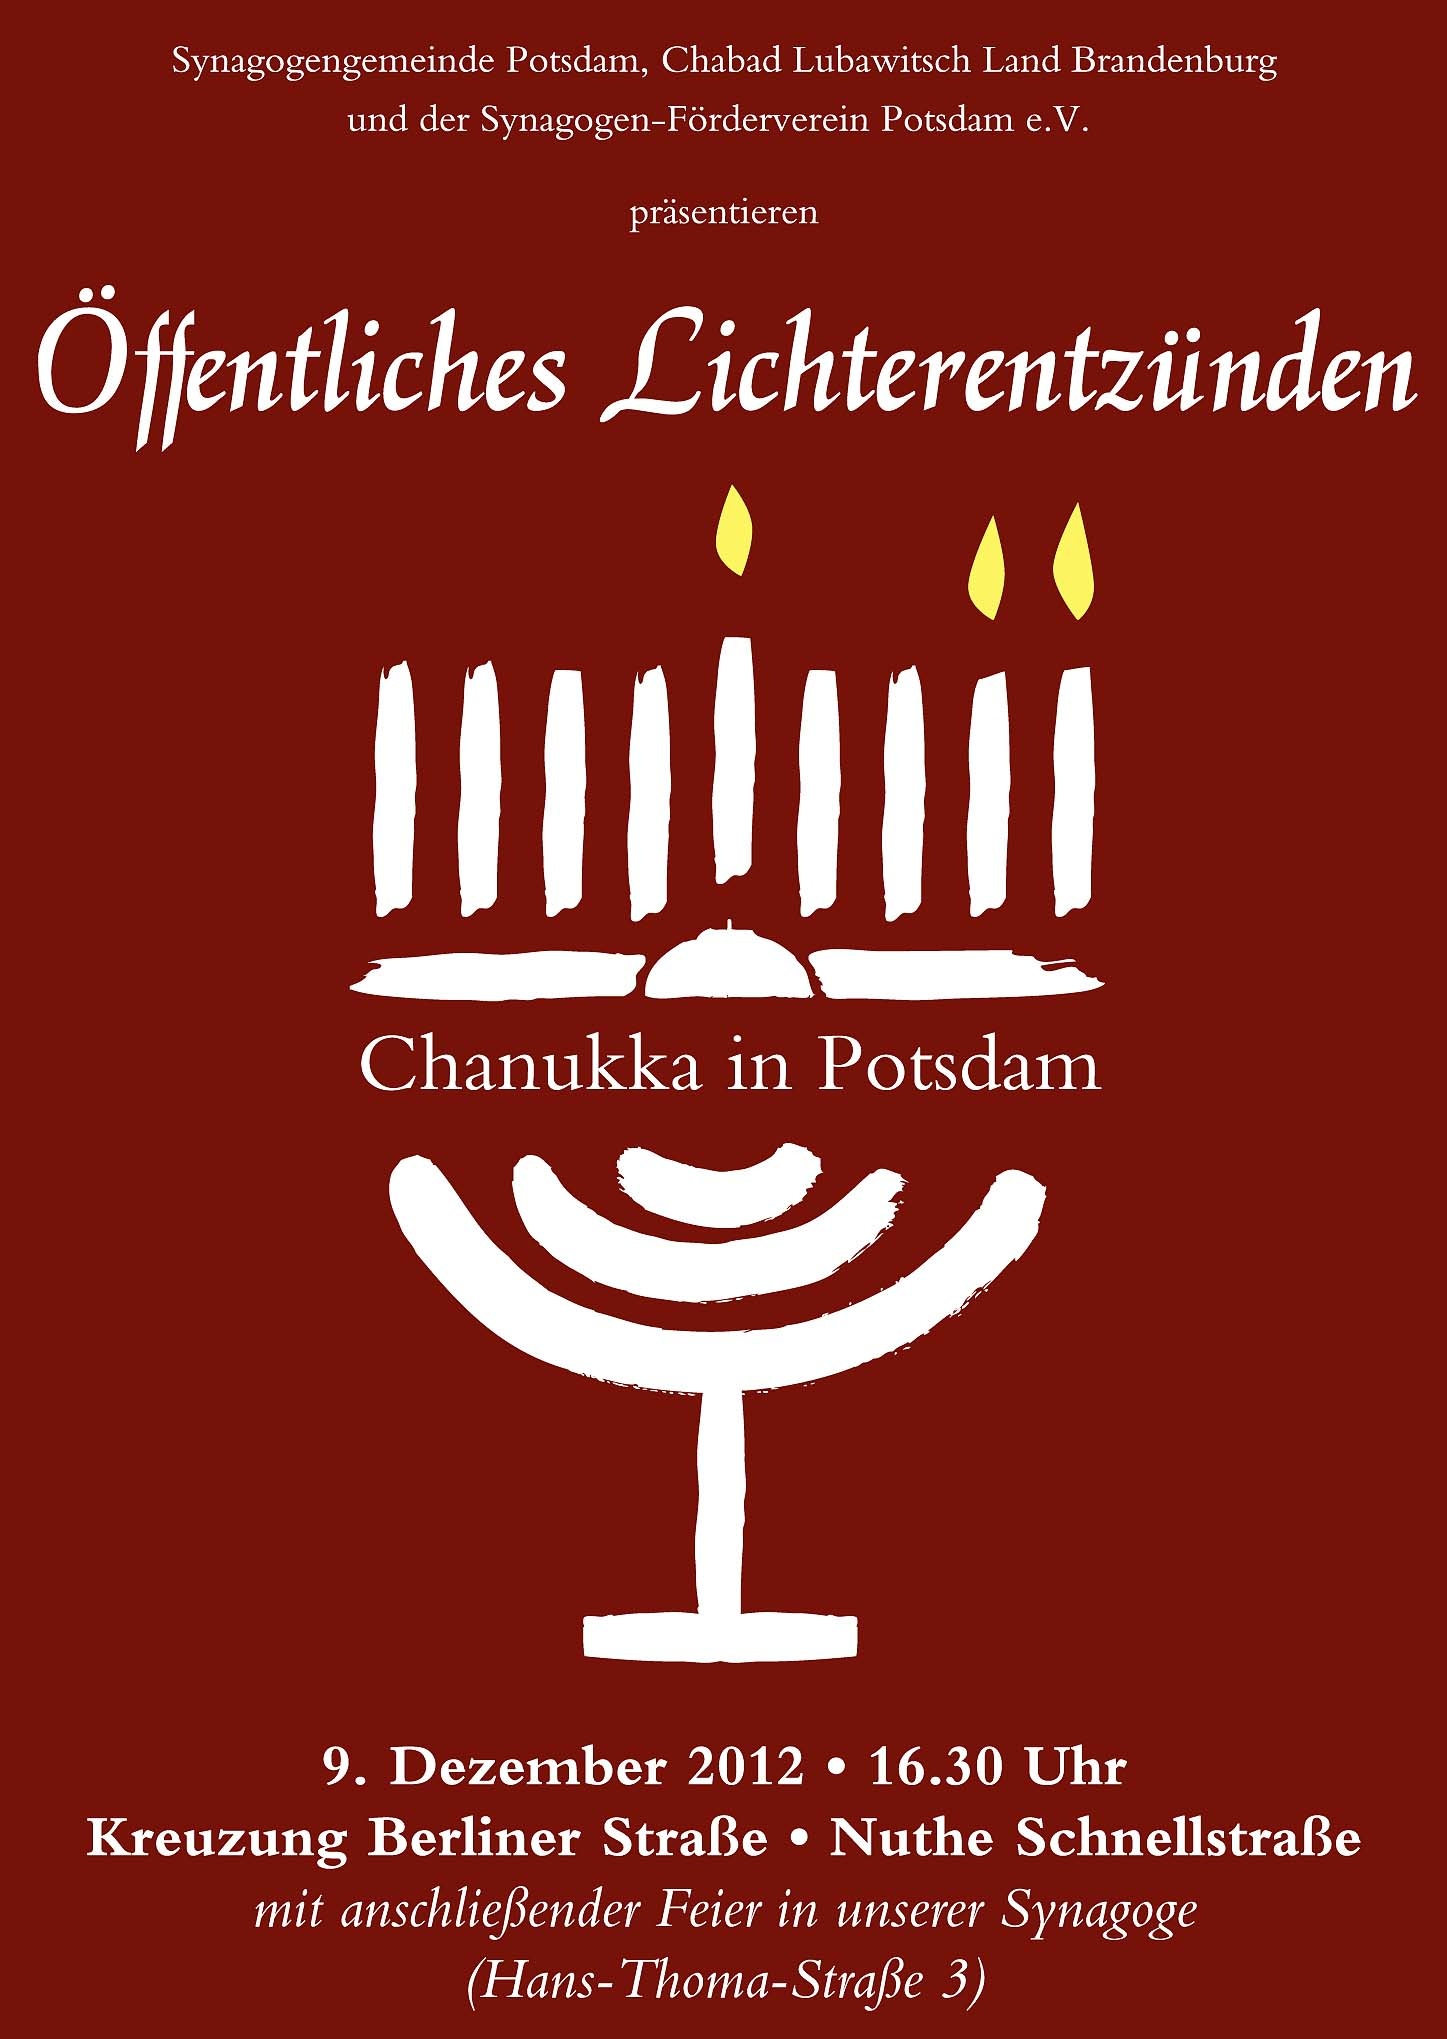 Potsdam Hanukkia Einladung.jpg